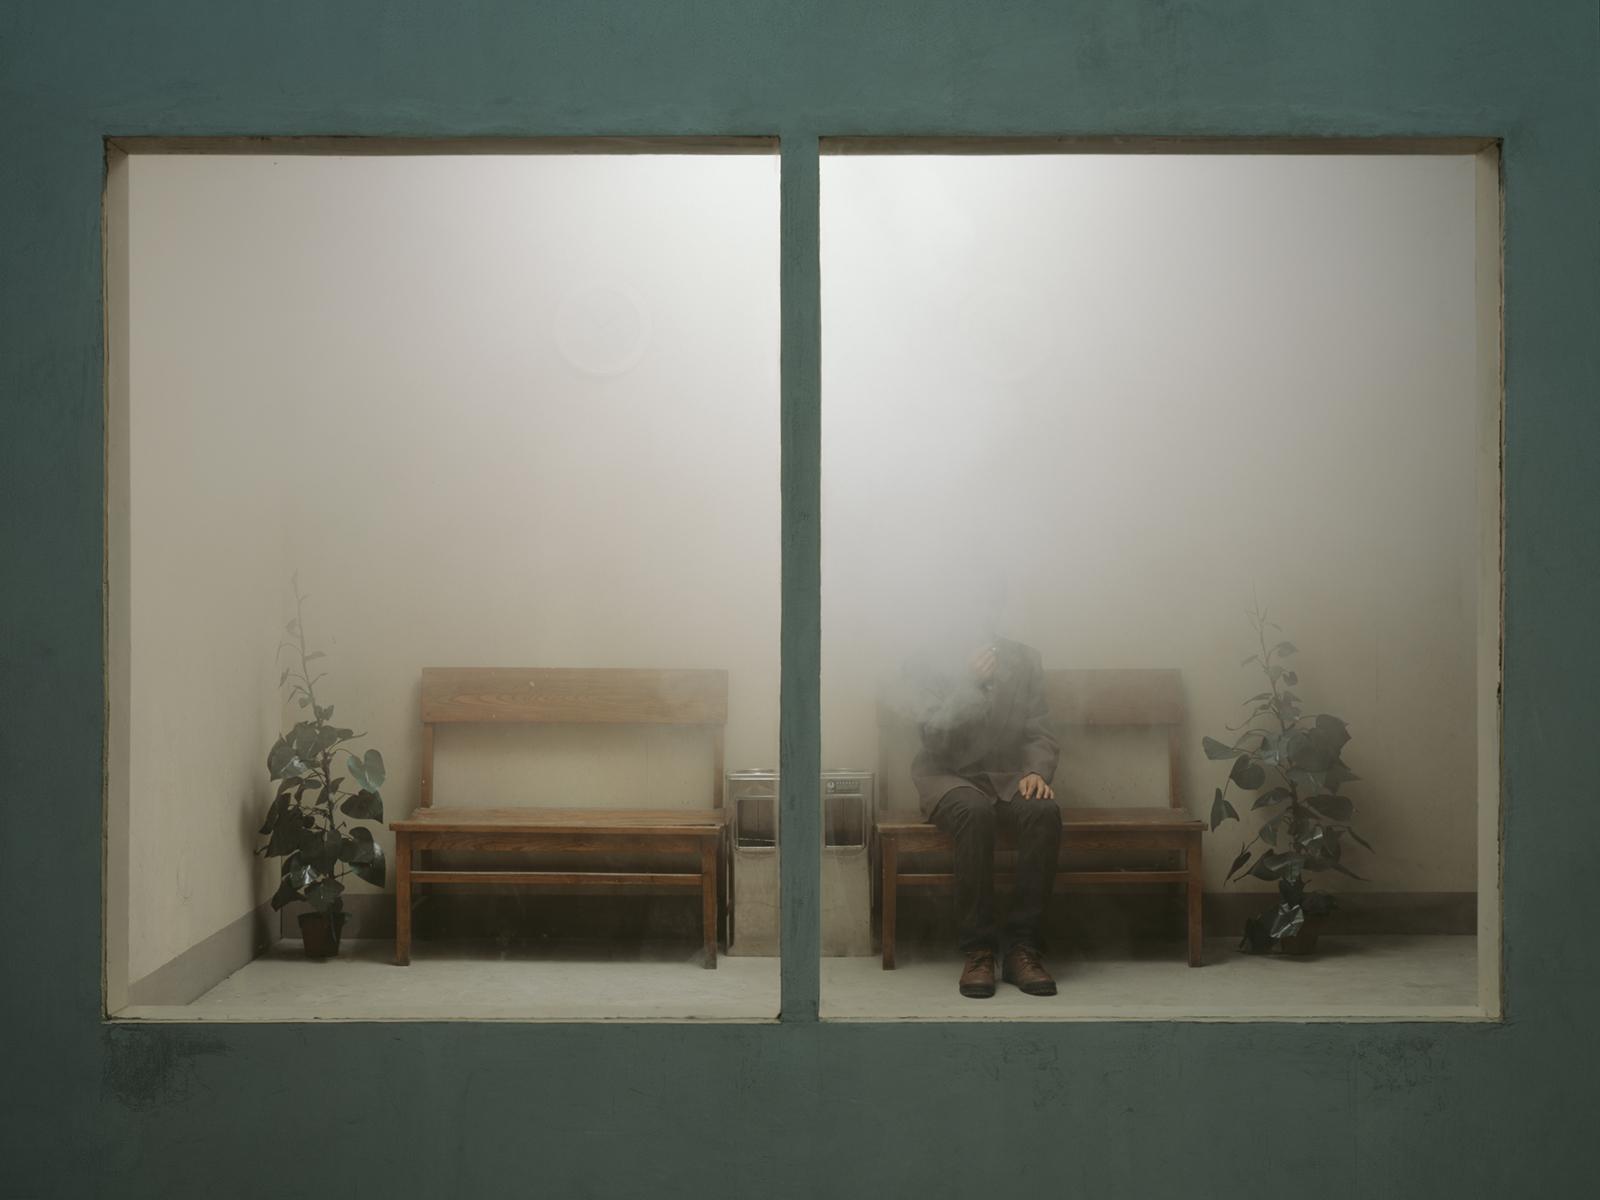 Chen Wei 陈维, A Foggy Afternoon, 2012, Archival inkjet print 收藏级艺术微喷, 150 x 00 cm